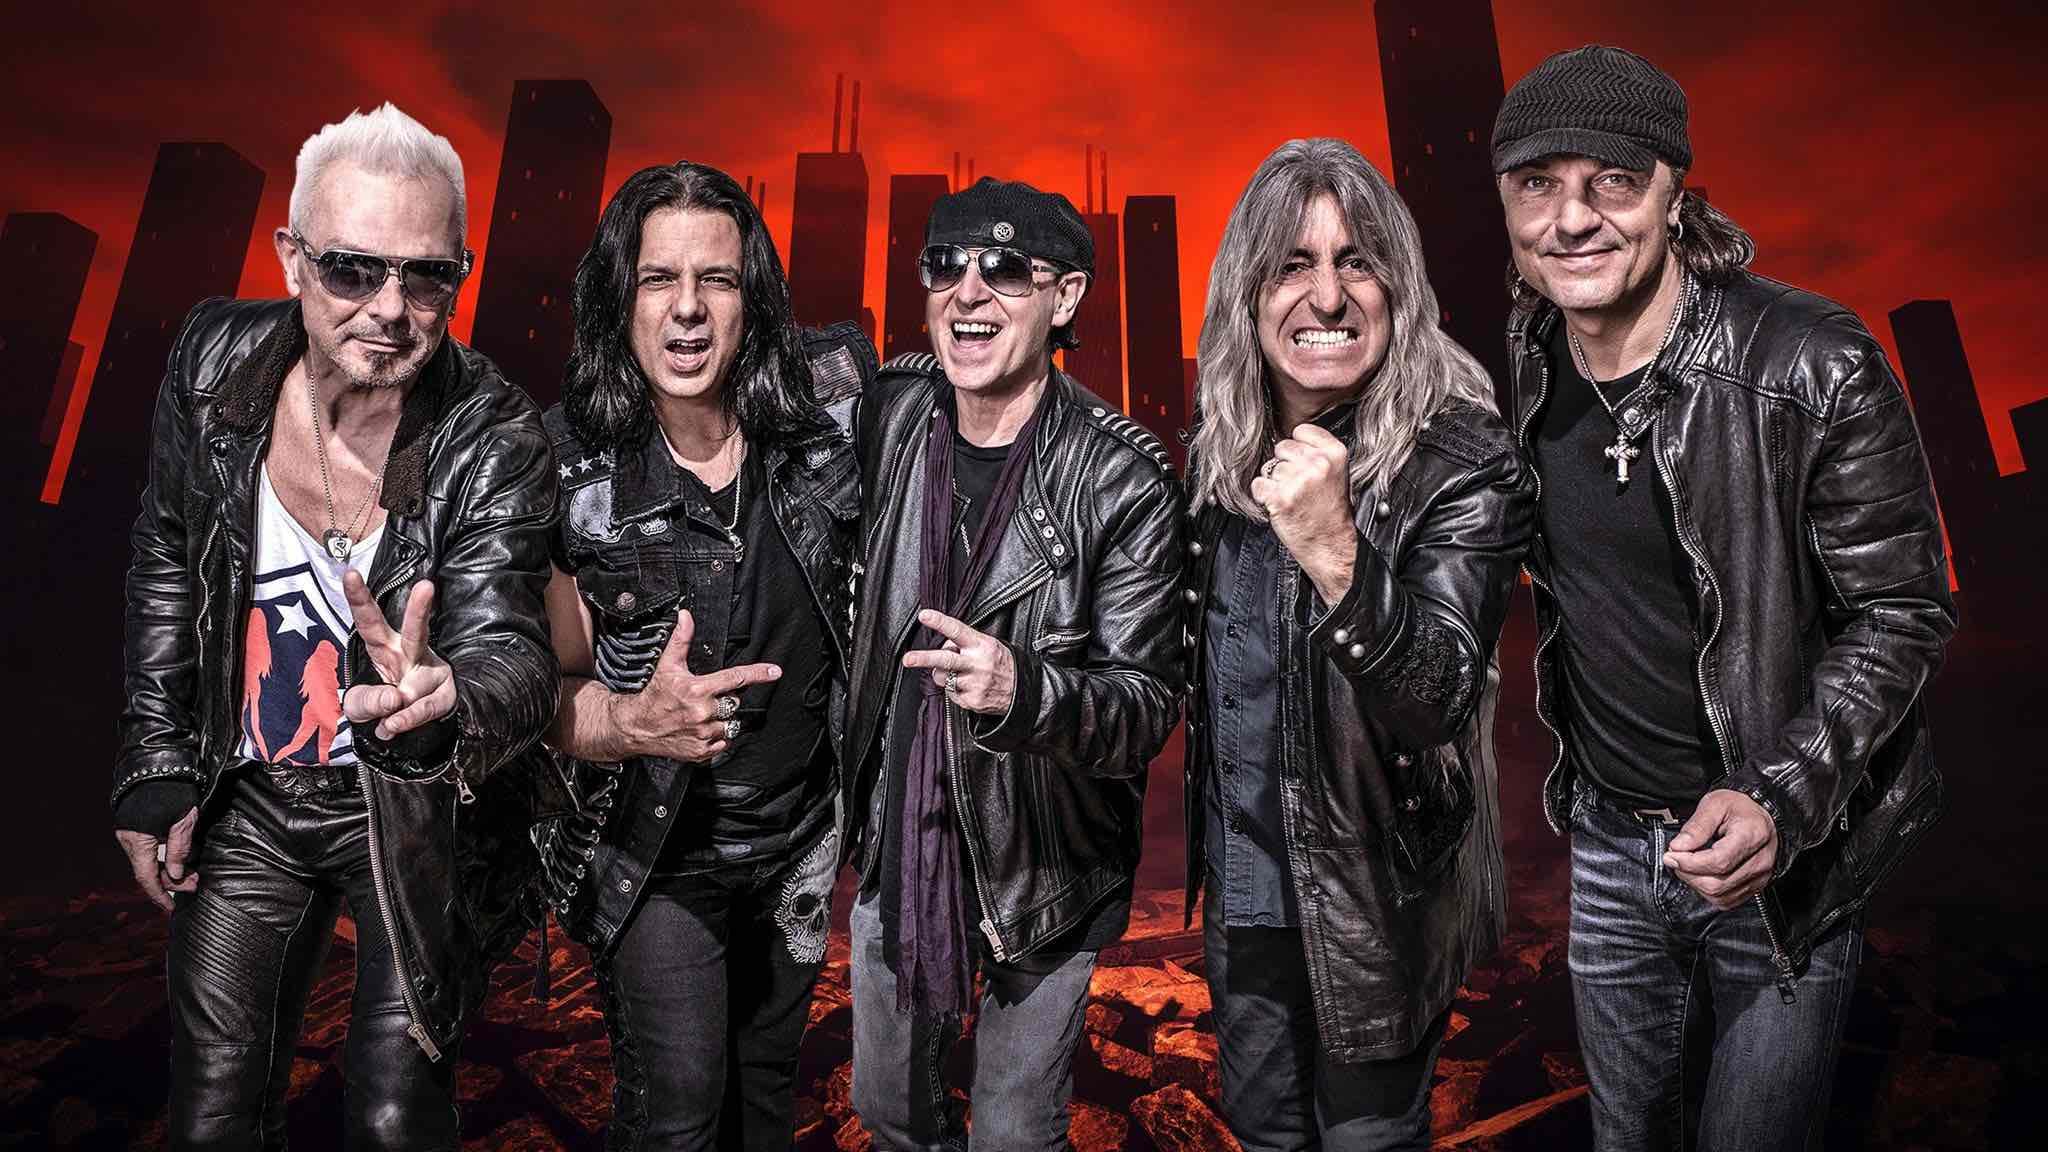 Scorpions - Sign of hope - confinement - retour